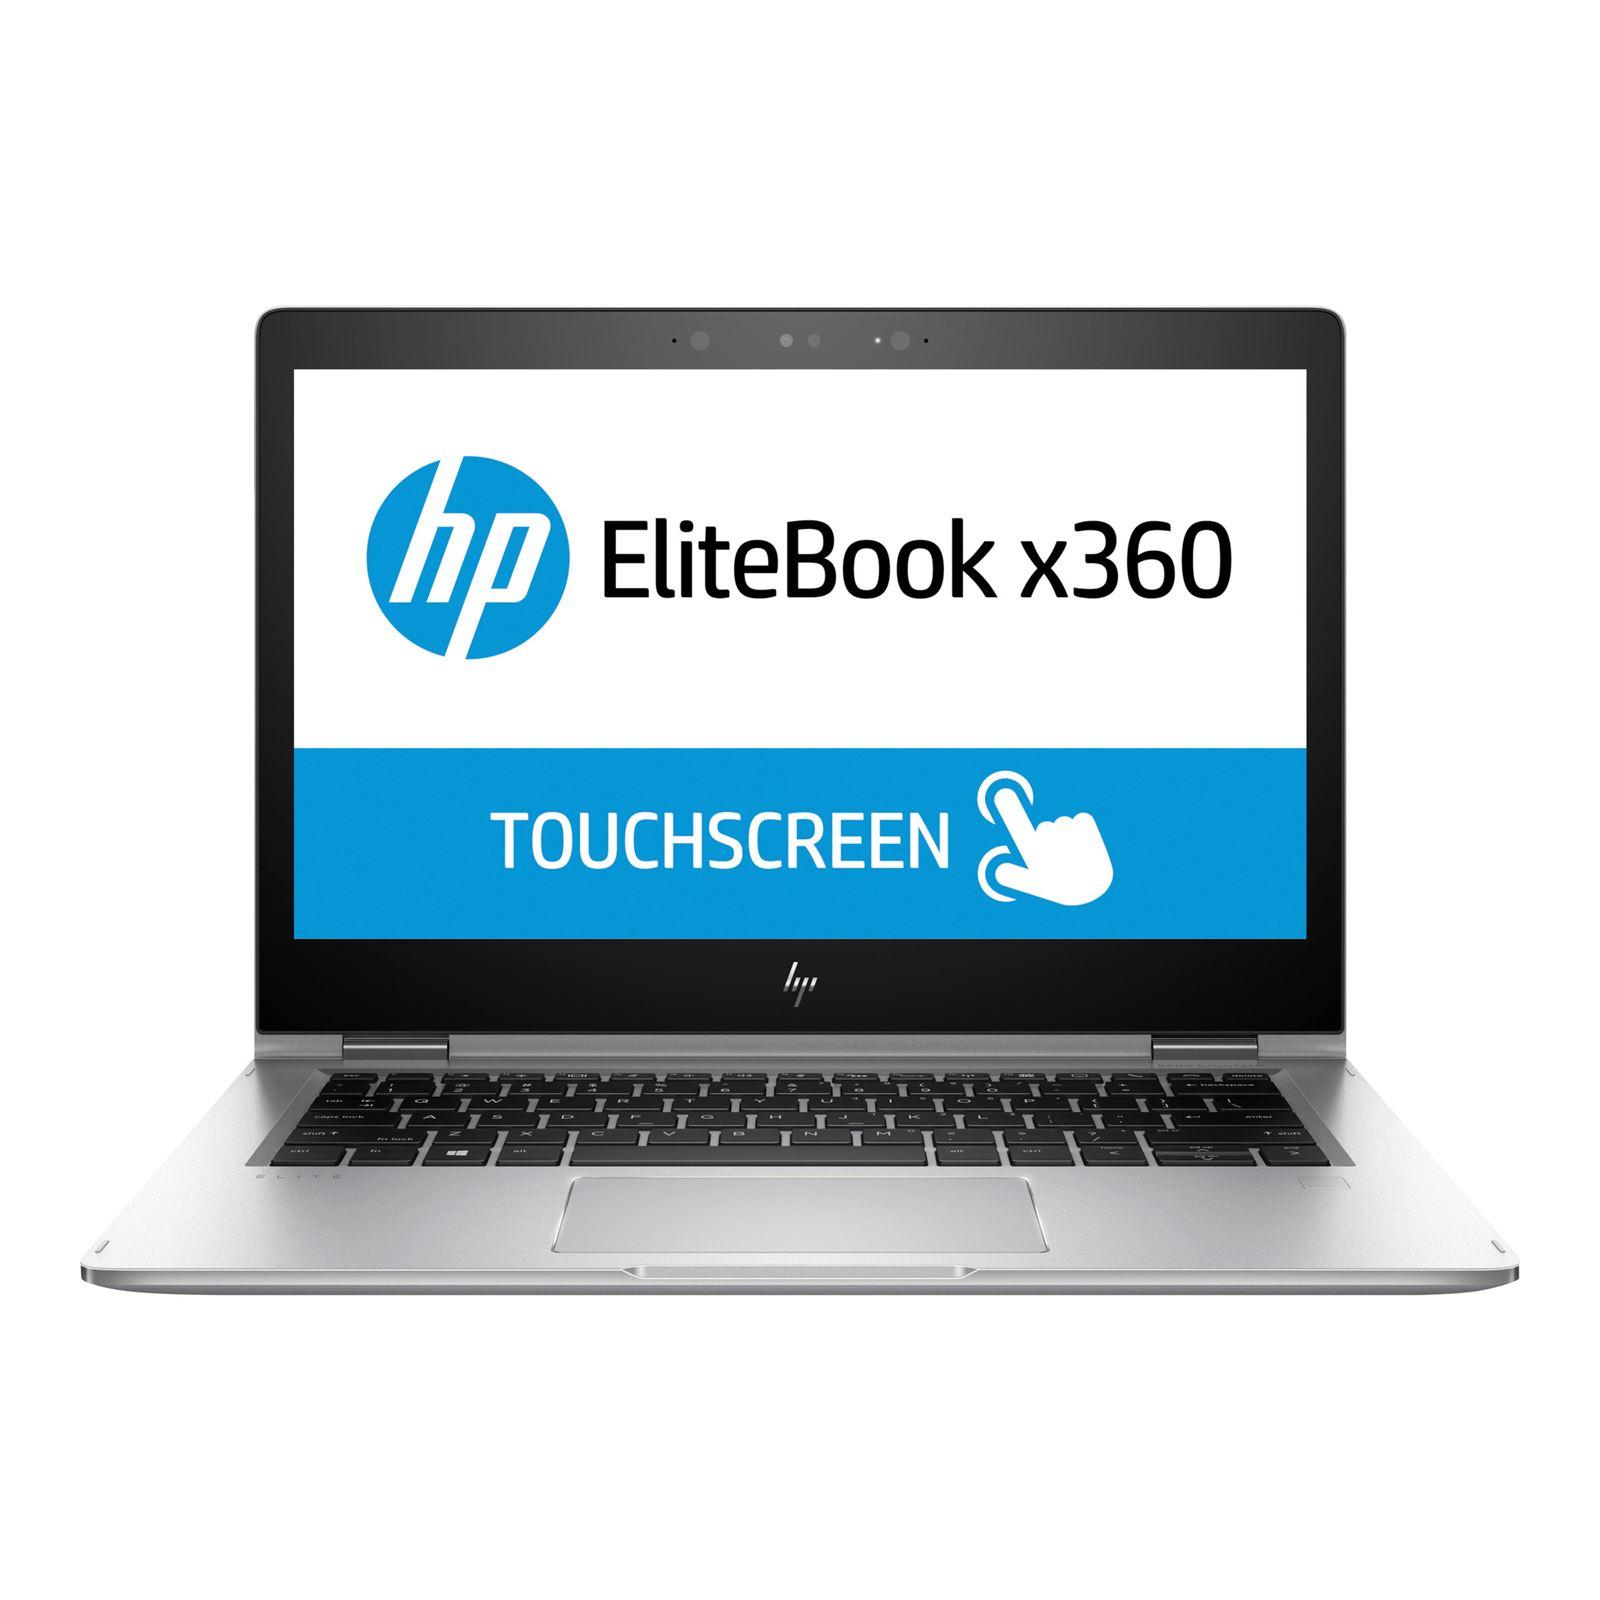 Rabljen prenosnik HP EliteBook x360 1030 G2 / i5 / RAM 8 GB / SSD Disk / 13,3″ / FHD